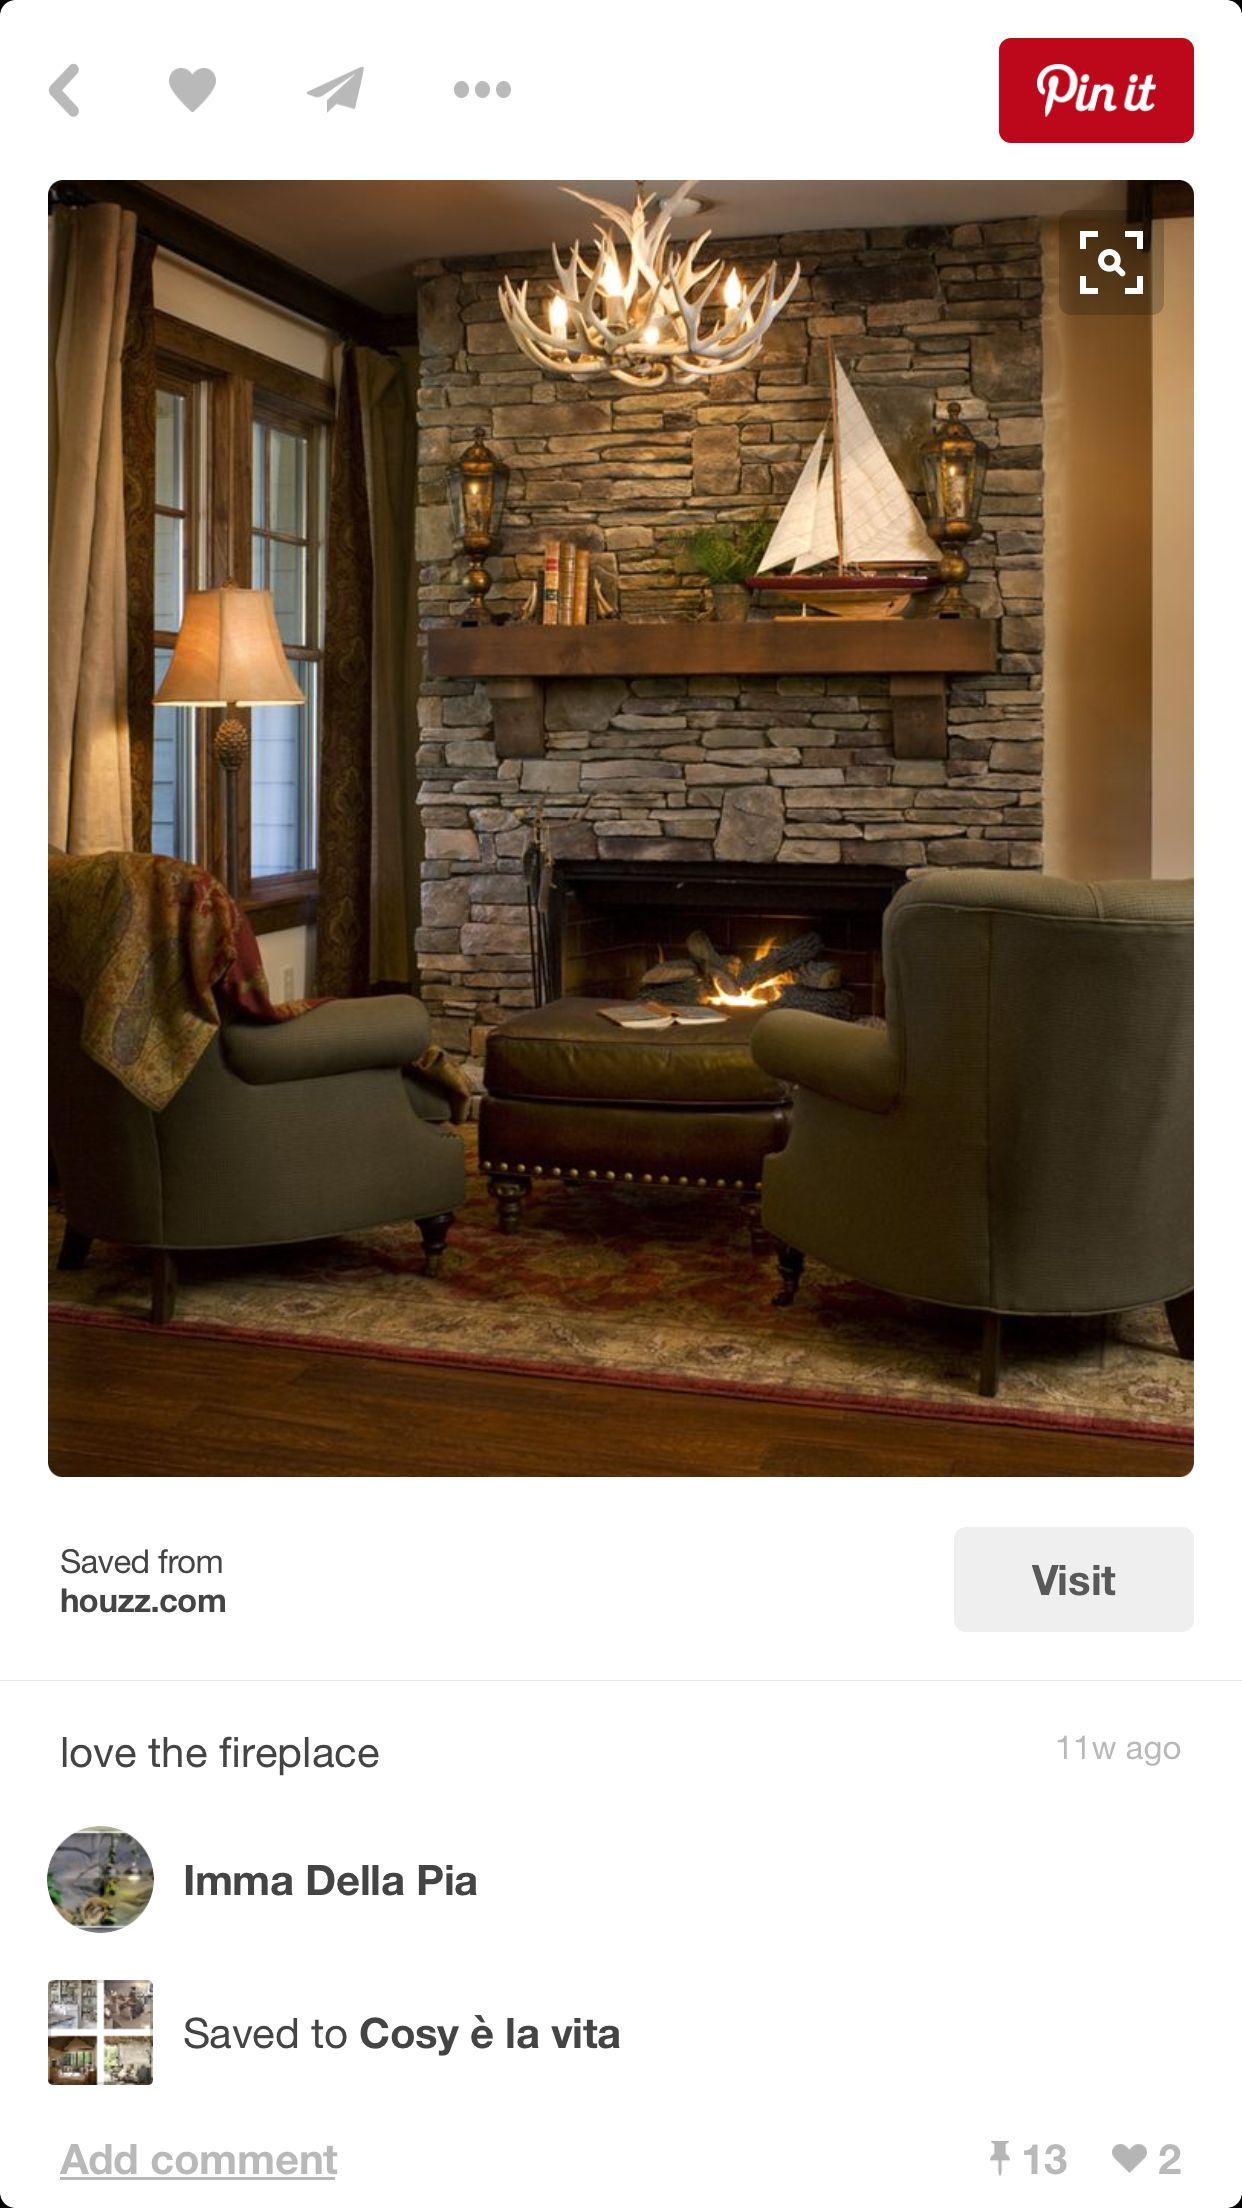 Campos estufas hogar chimenea dise o de chimenea y for Diseno de estufas hogar a lena